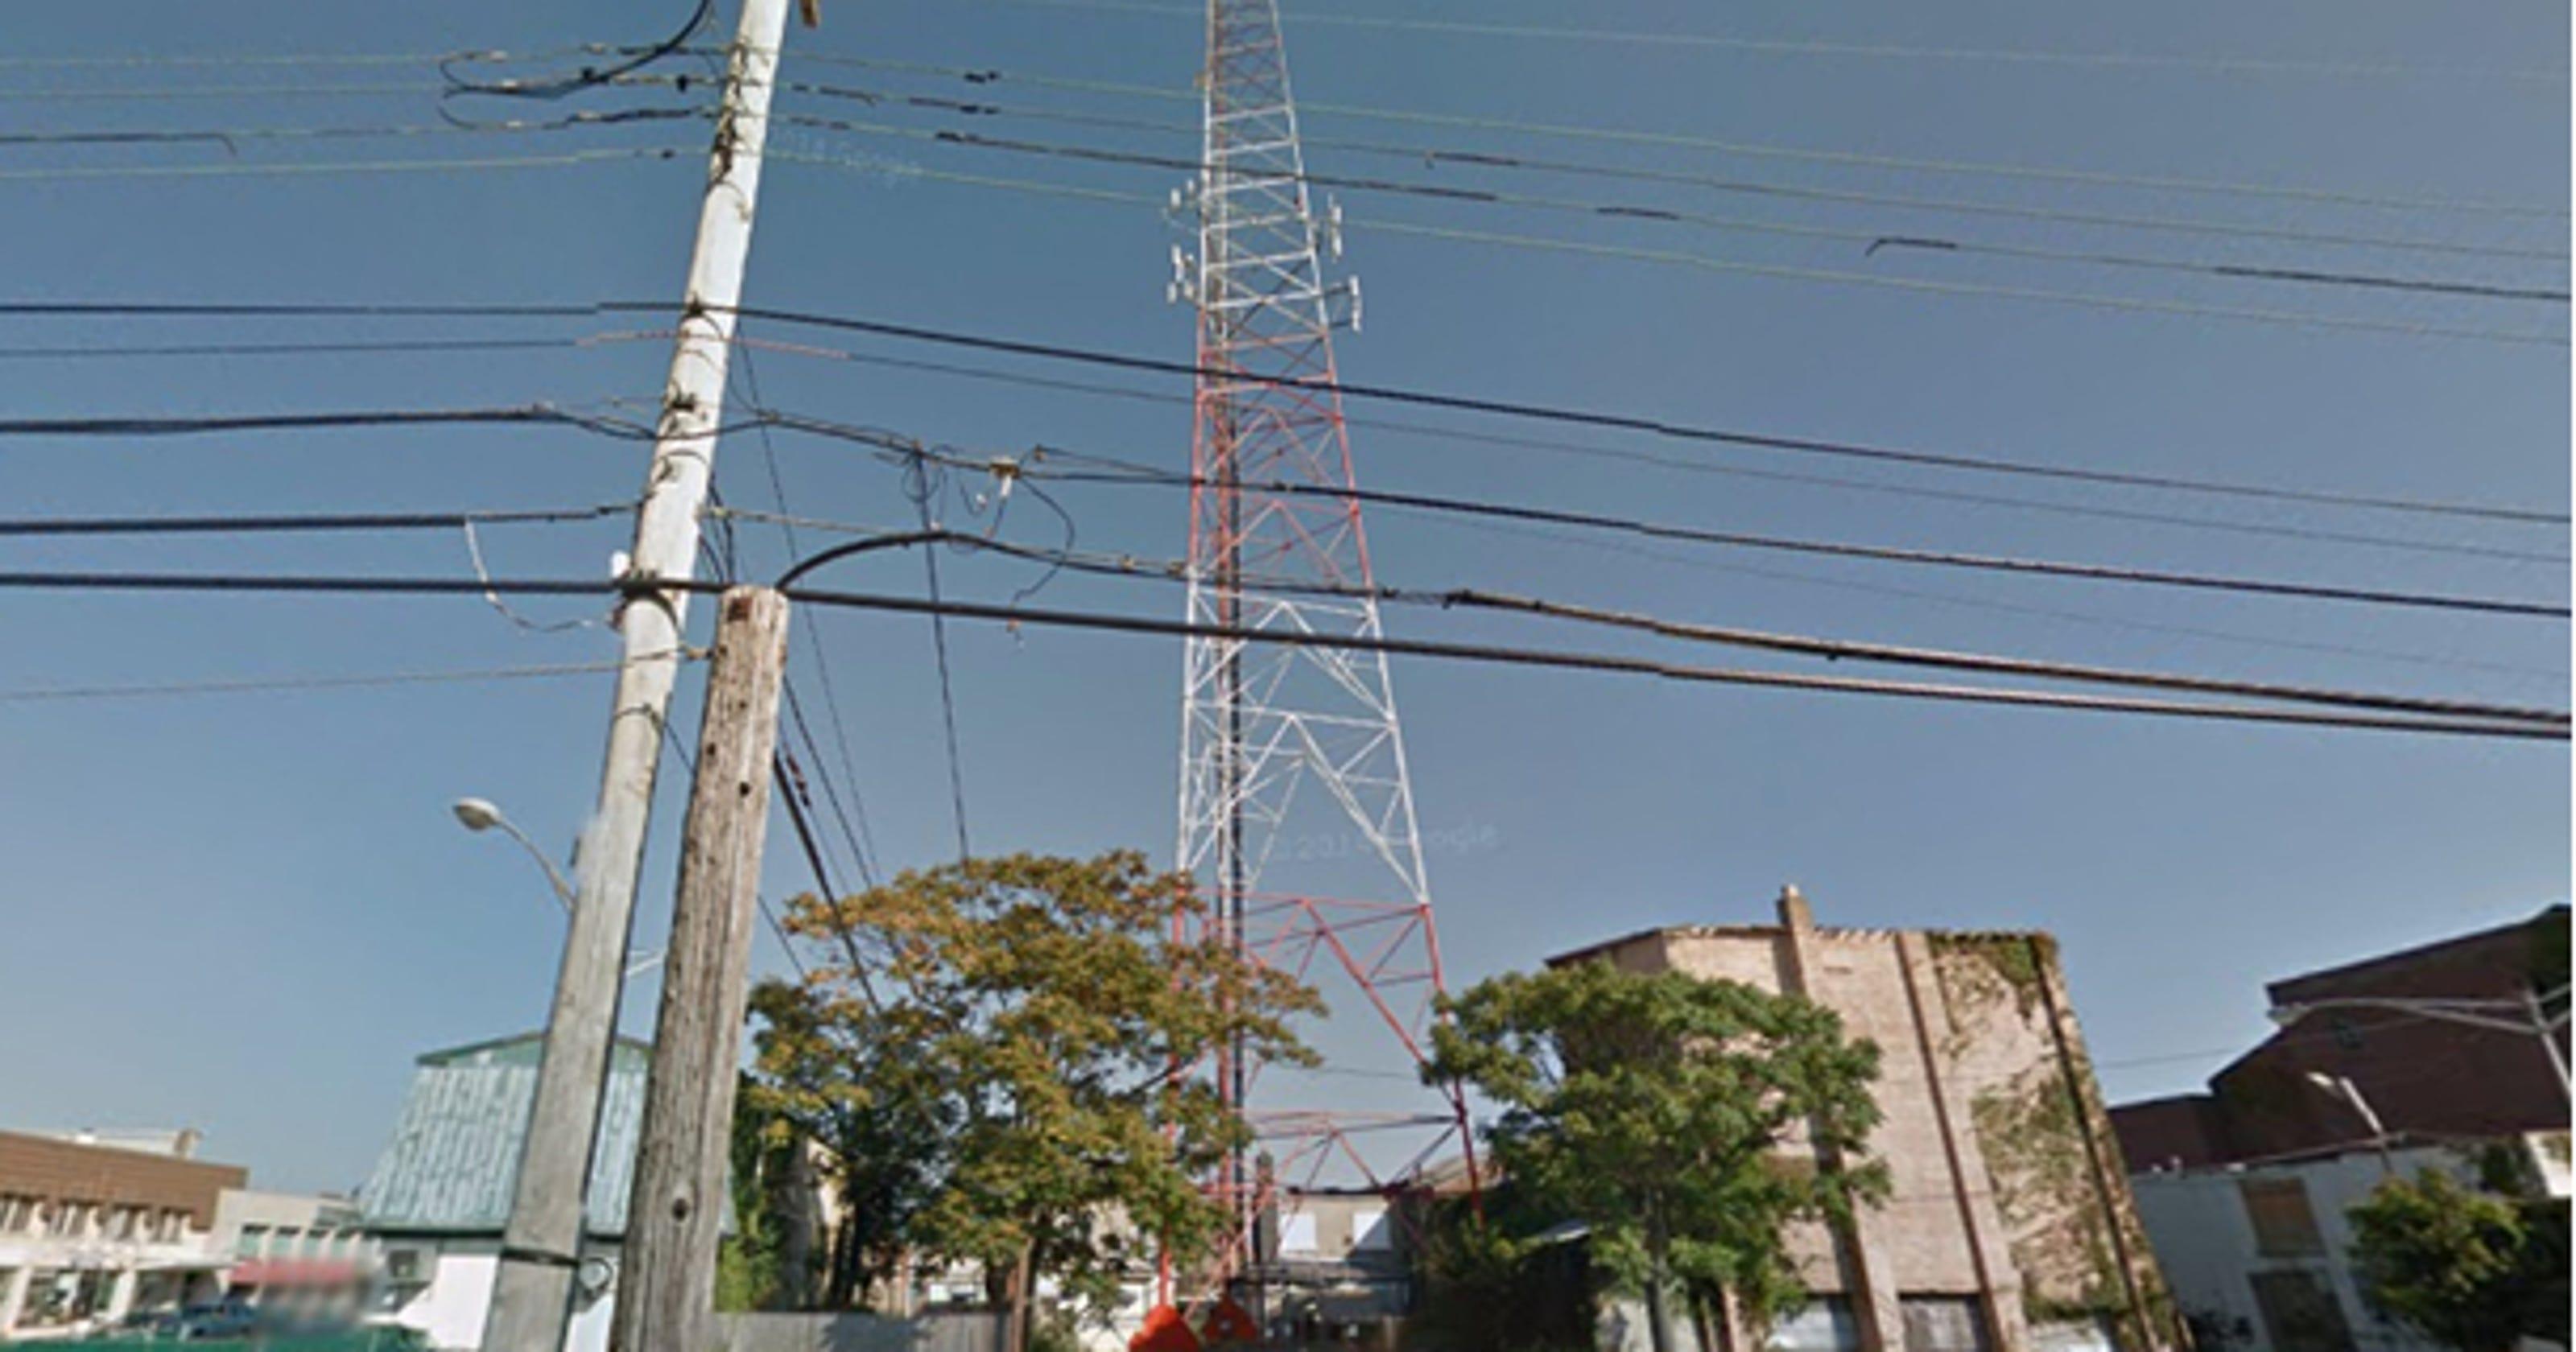 Long Branch radio tower jumper identified